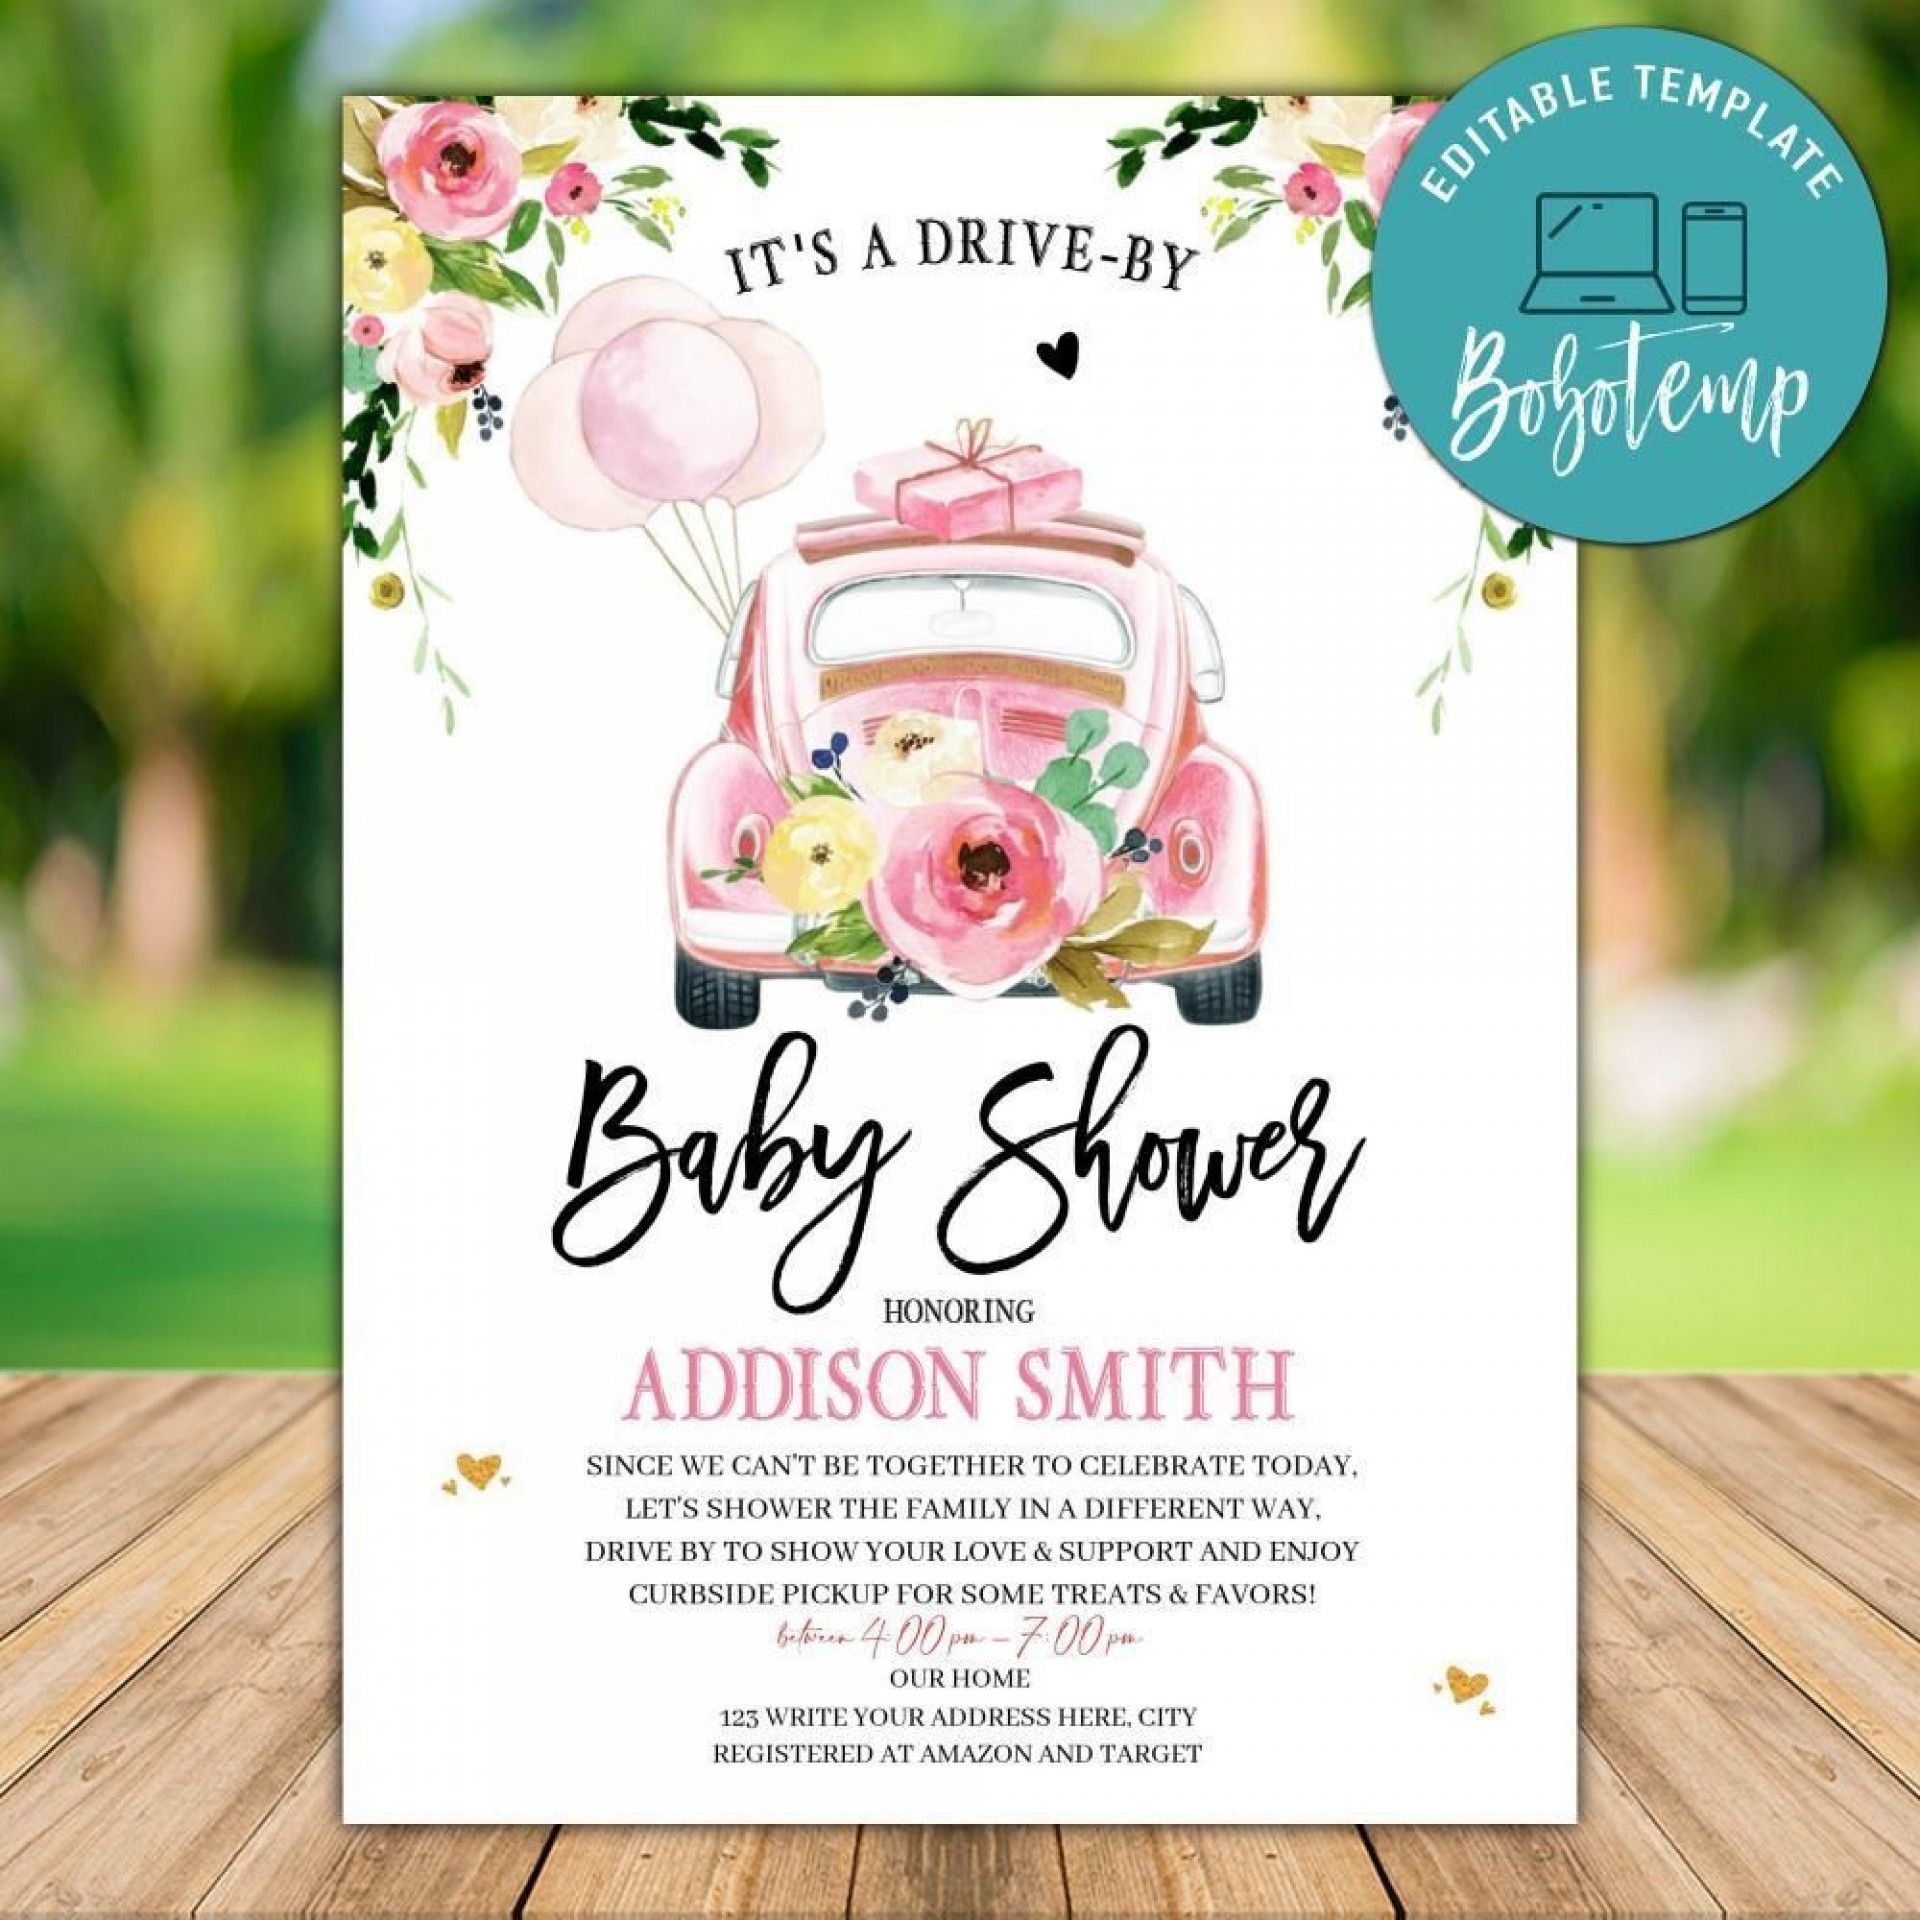 007 Surprising Diy Baby Shower Invitation Template Inspiration  Templates Diaper Free1920